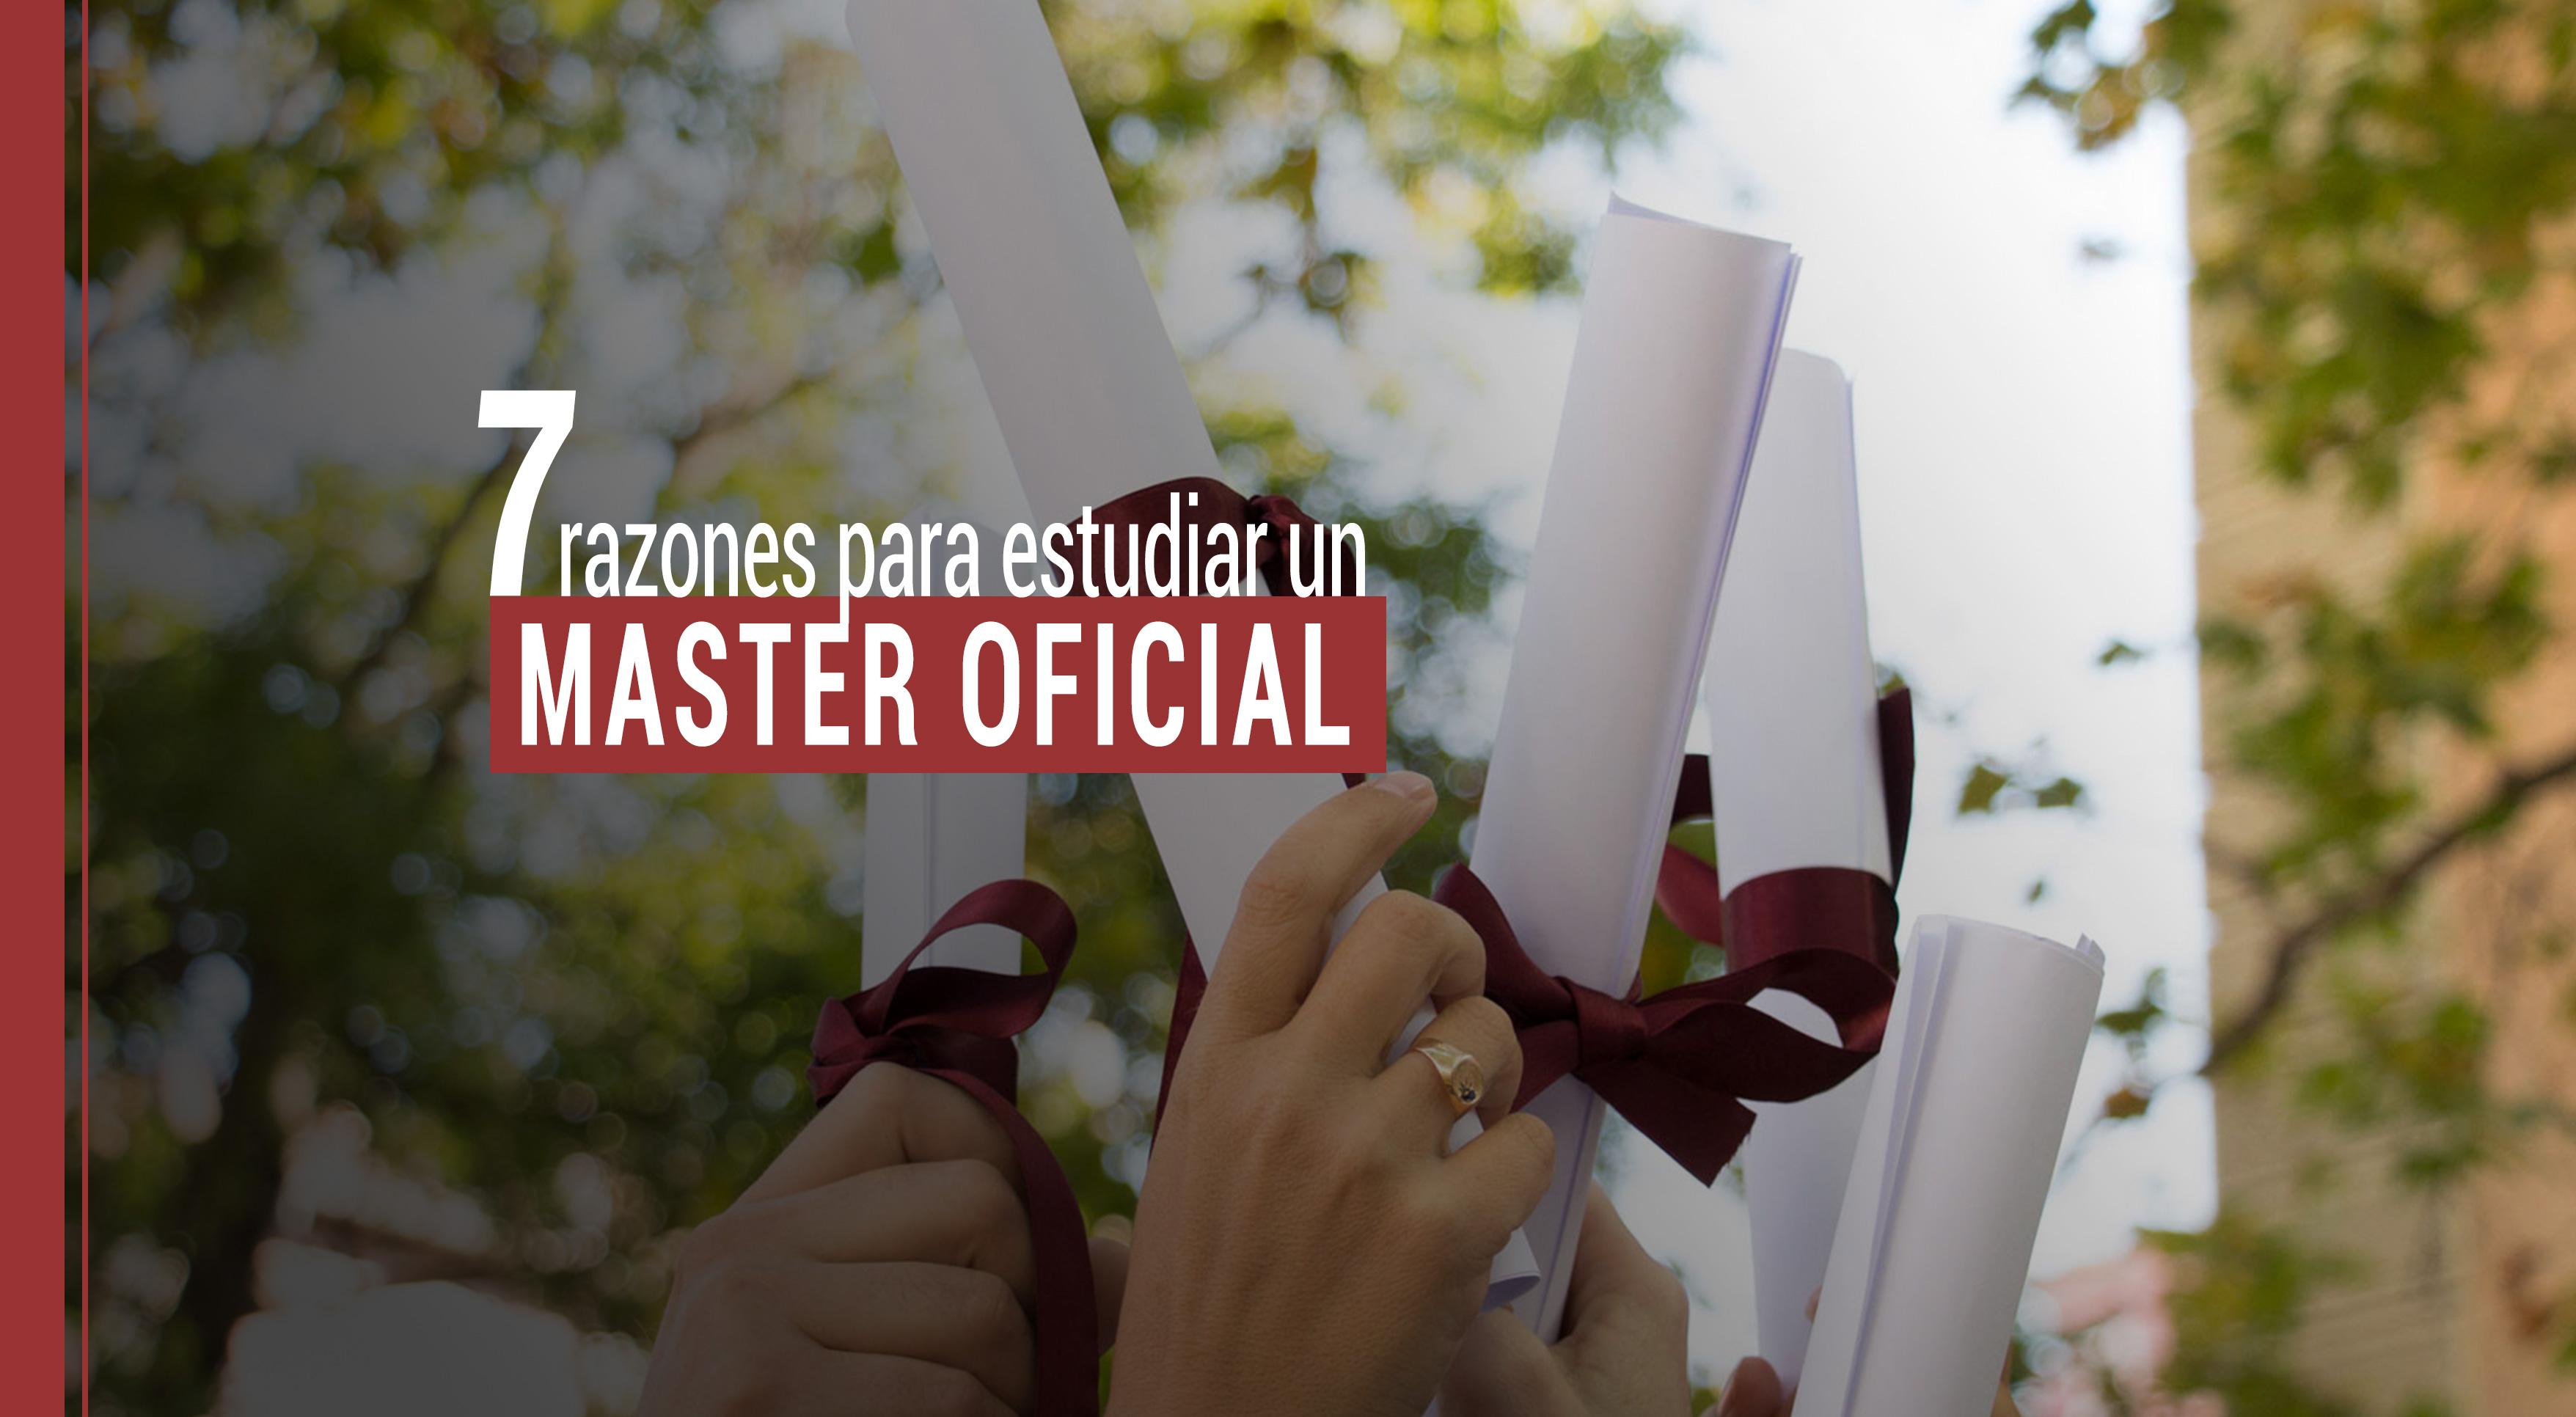 7-razones-estudiar-master-oficial 7 razones para estudiar un Master Oficial